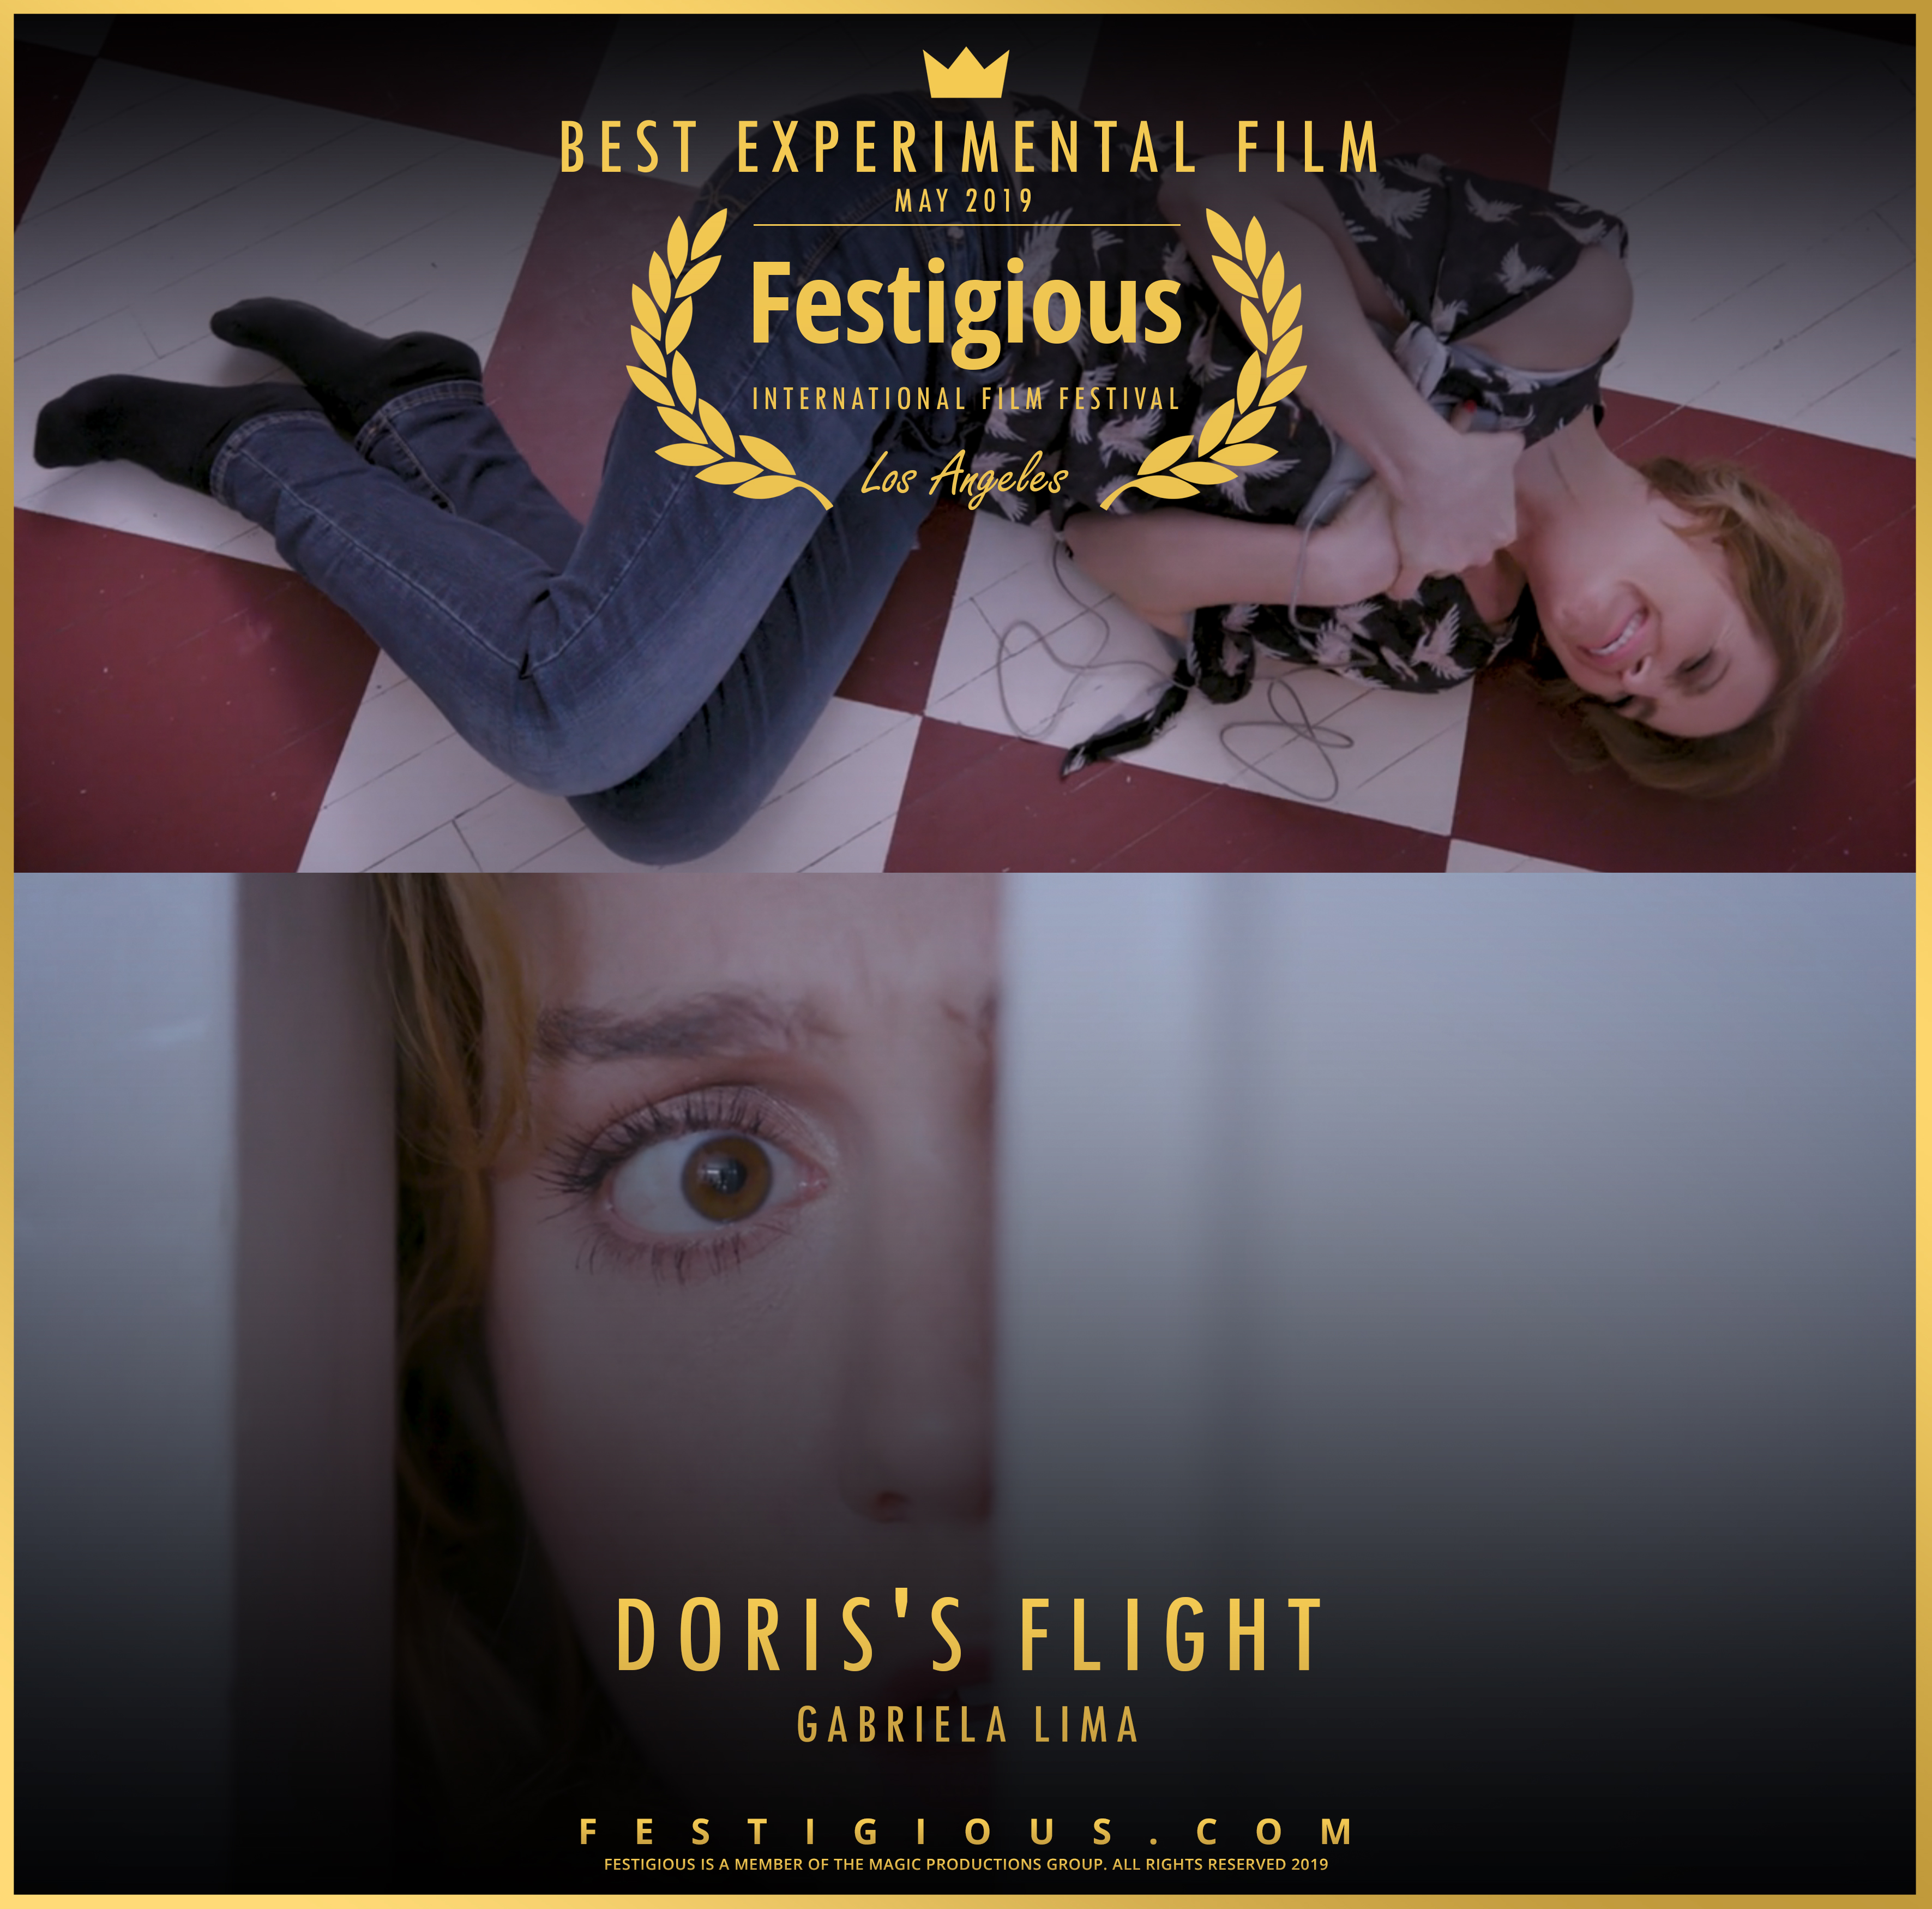 DORIS'S FLIGHT design